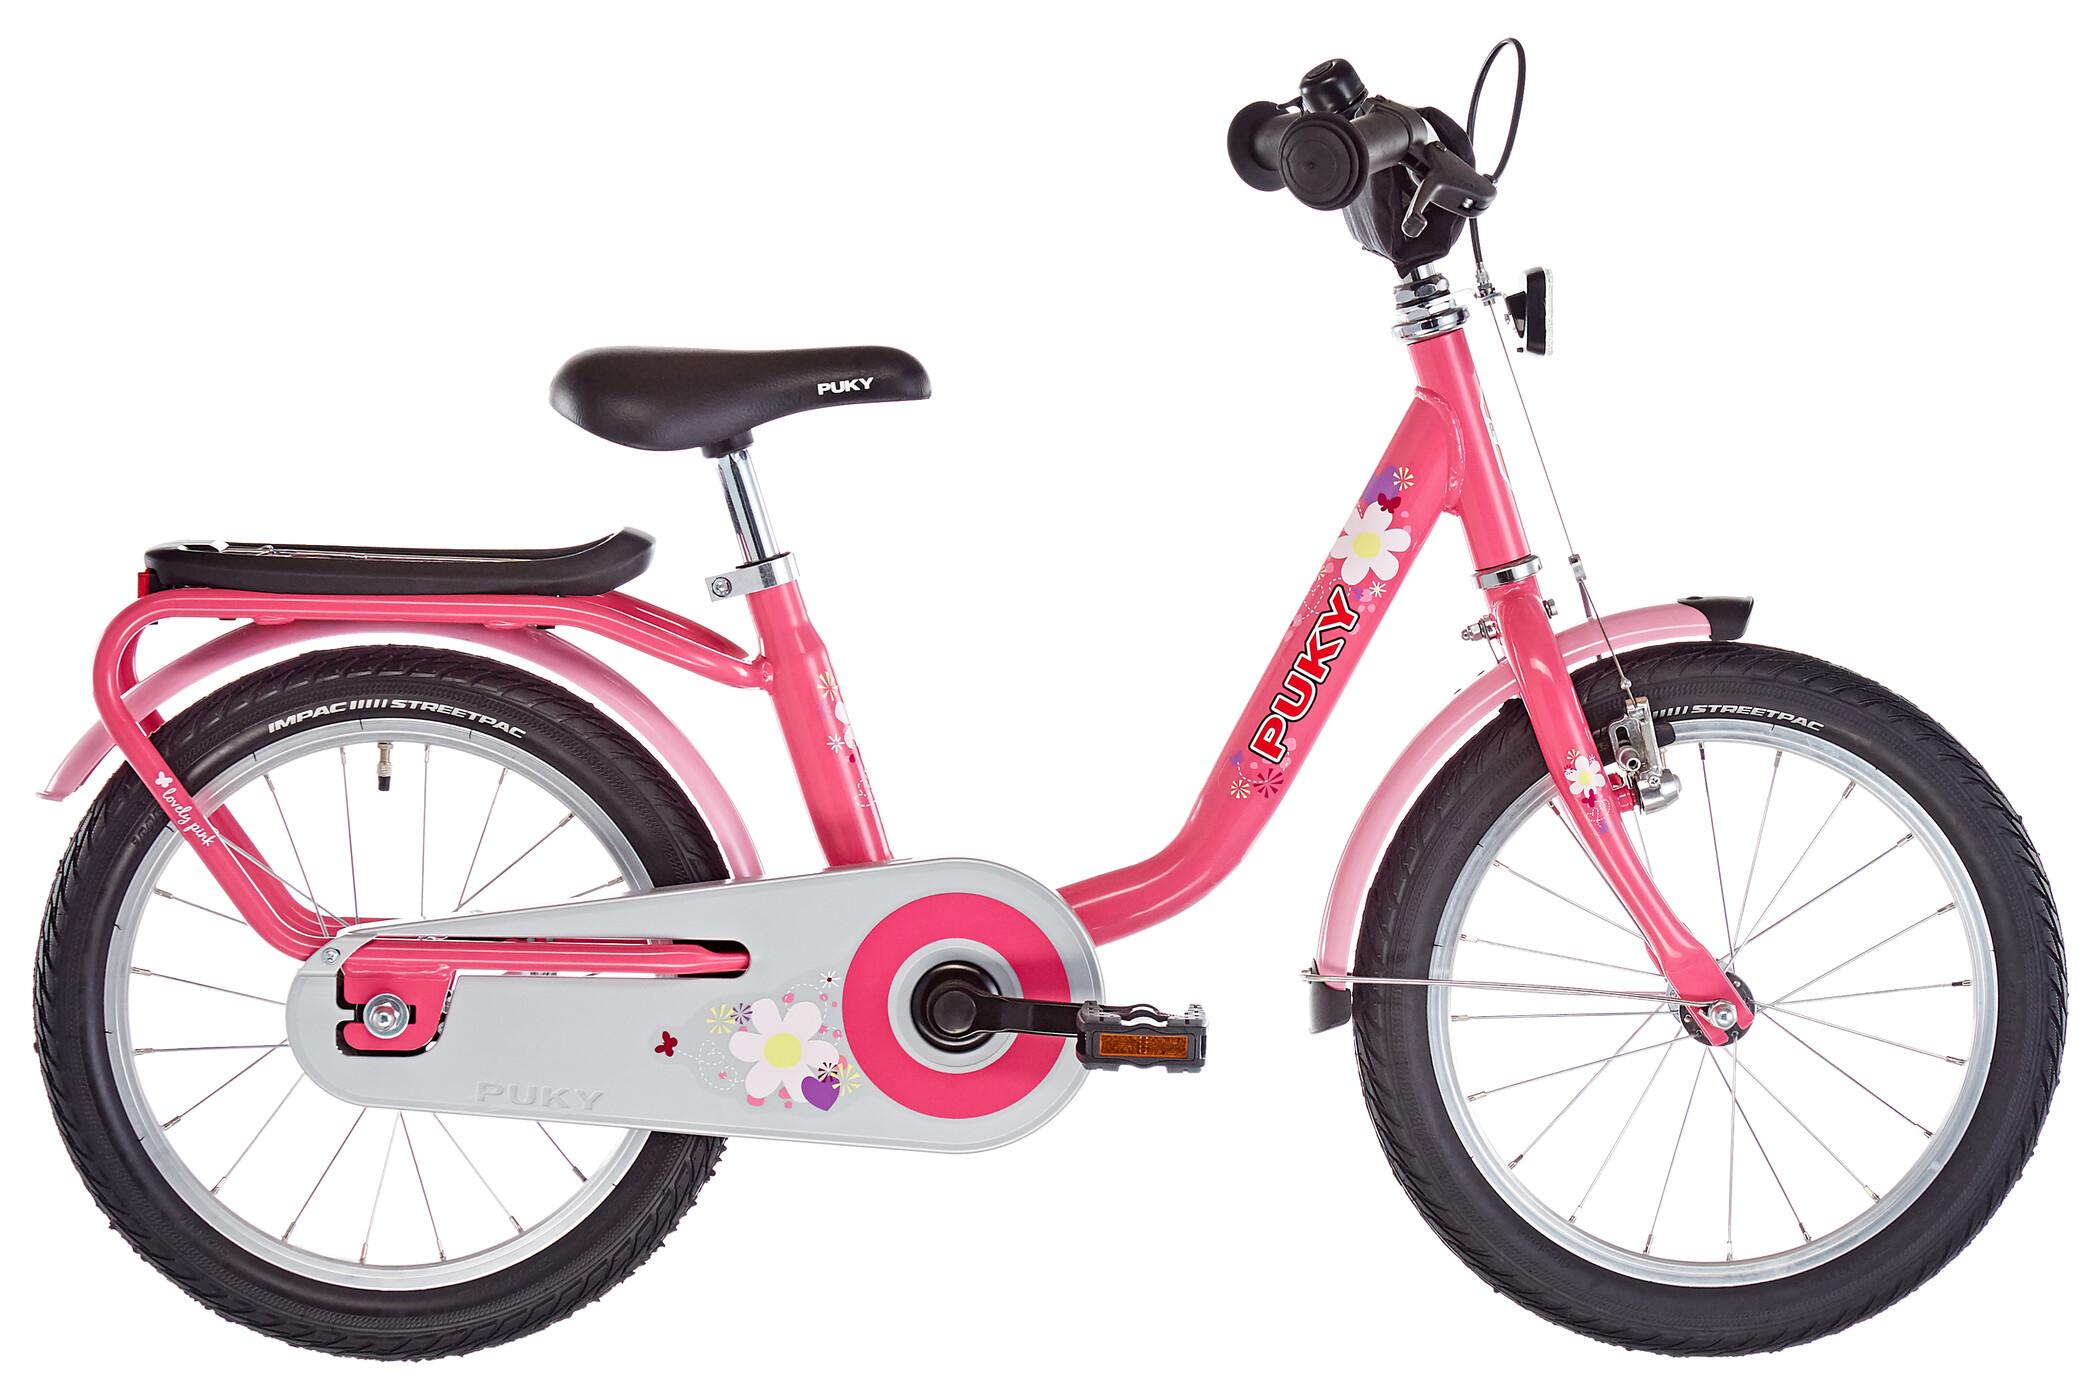 Puky Z 6 Børnecykel 16